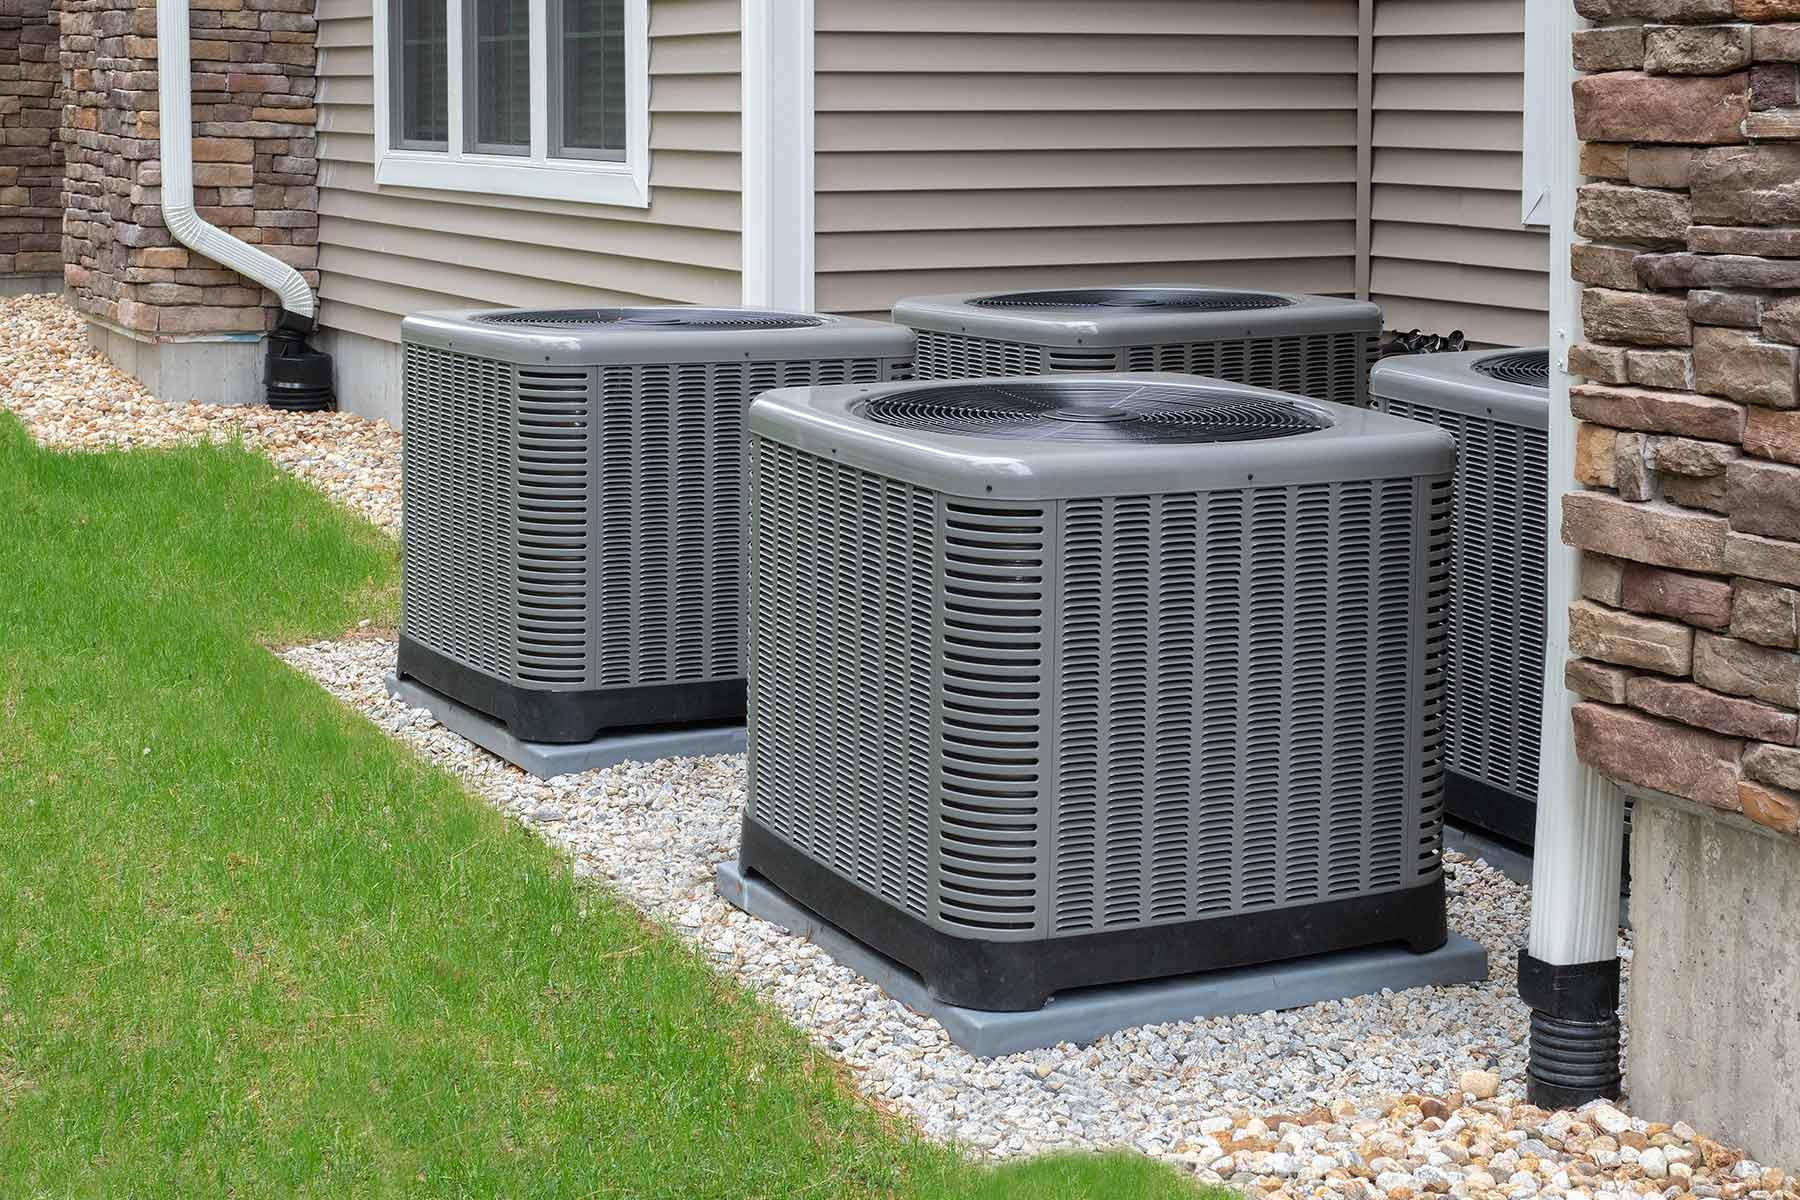 four-heat-pump-units-powering-house-fresno-ca